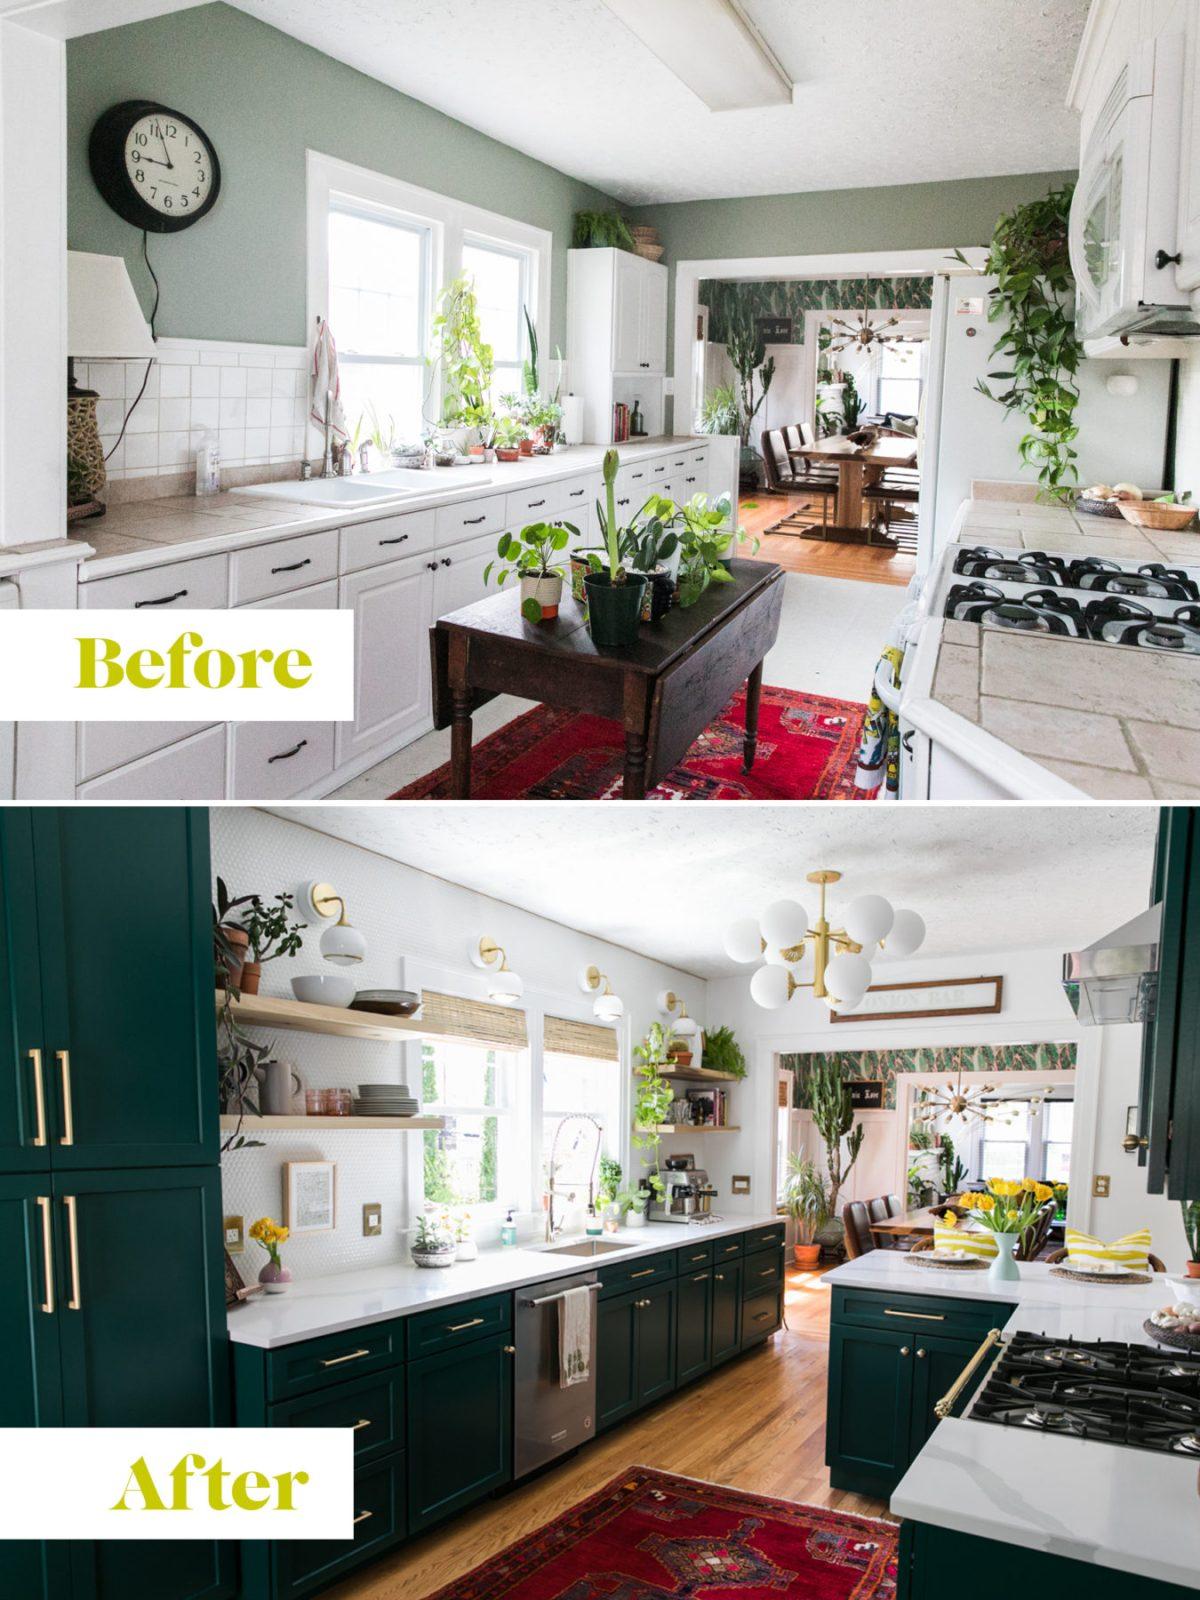 One Room Challenge | Dark Green Kitchen Glamazon | Kitchen Mood Board | Open Kitchen Design | Kitchen Renovation | Jessica Brigham | Magazine Ready for Life | www.jessicabrigham.com